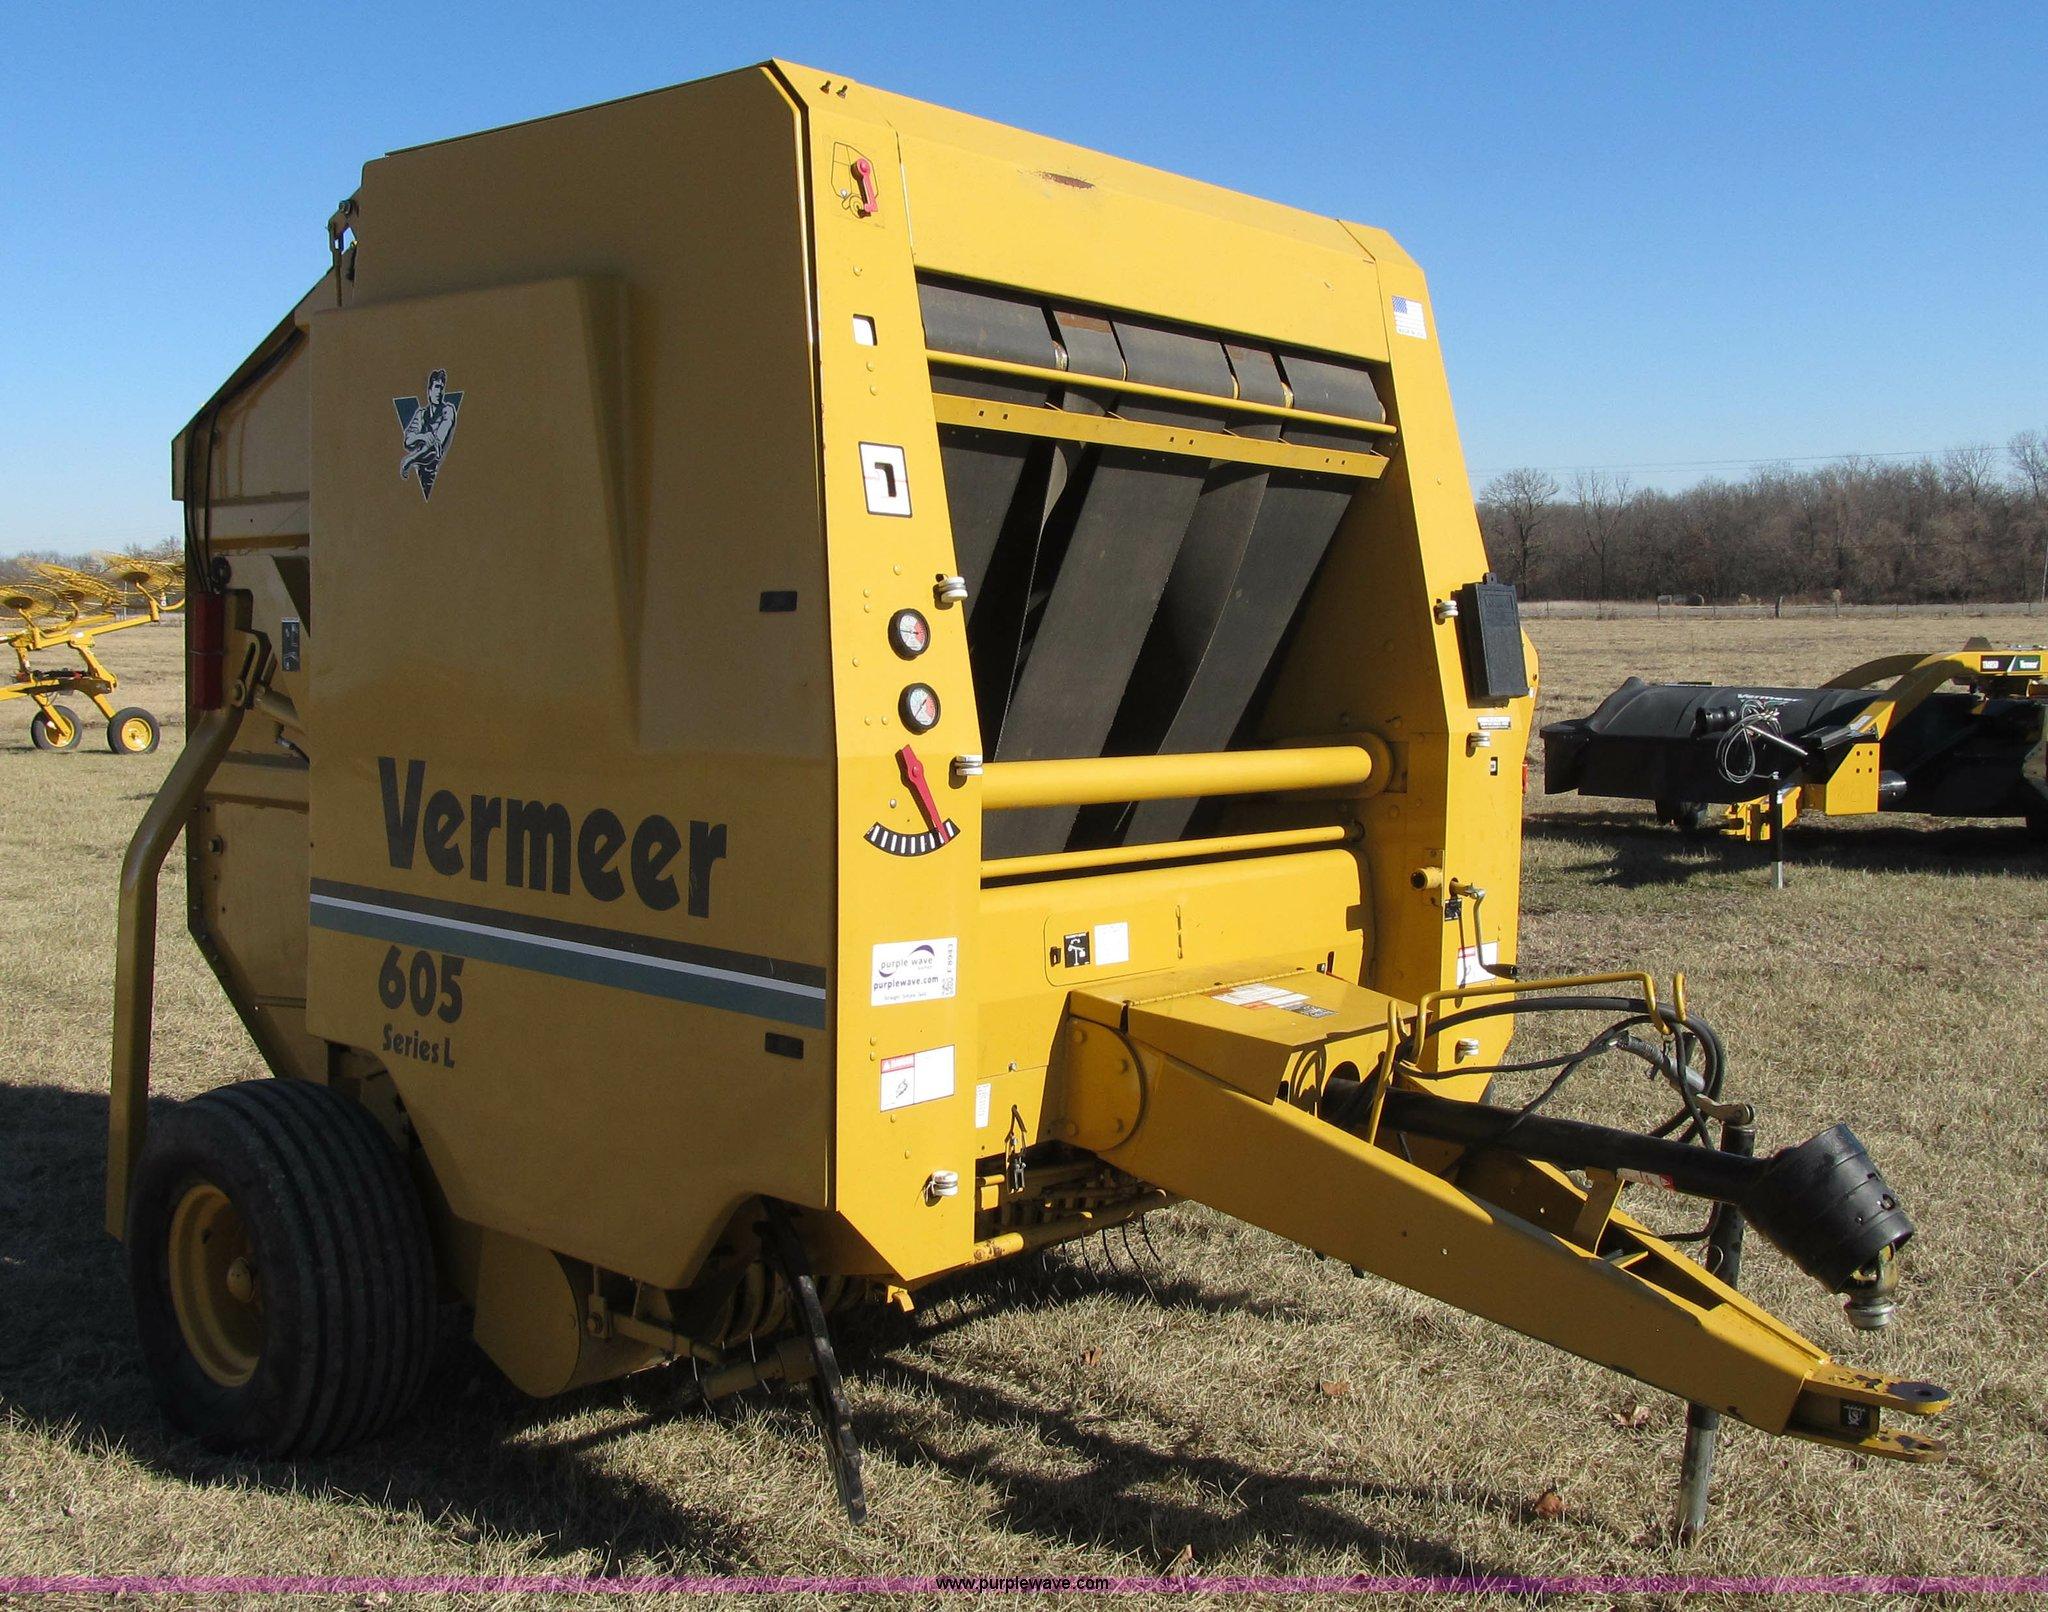 vermeer 605l round baler item f8943 sold february 11 ag rh purplewave com Vermeer 605C Round Baler Vermeer Baler Super M